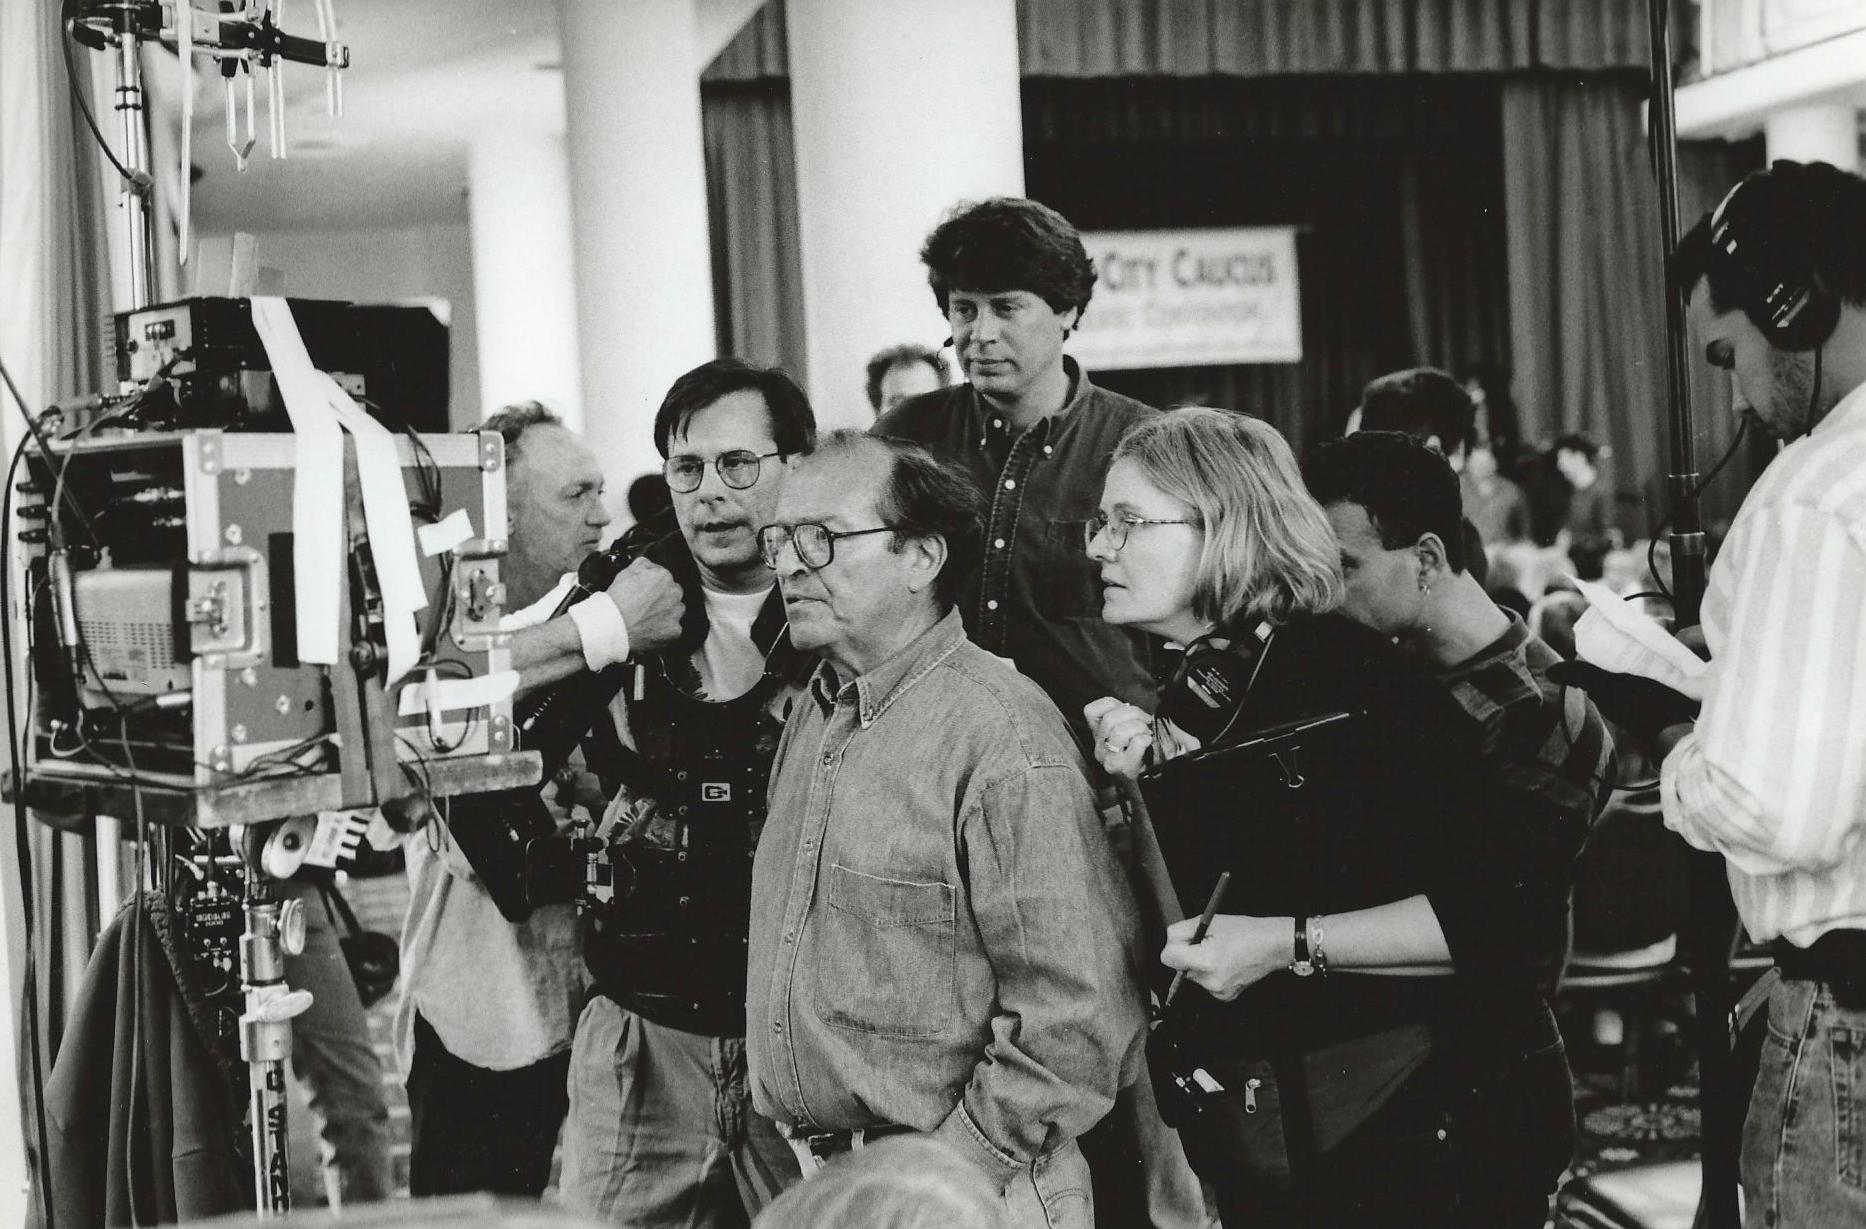 Martha Pinson with Sidney Lumet on the set of 'Night Falls on Manhattan.' Photo Credit Adger Cowans